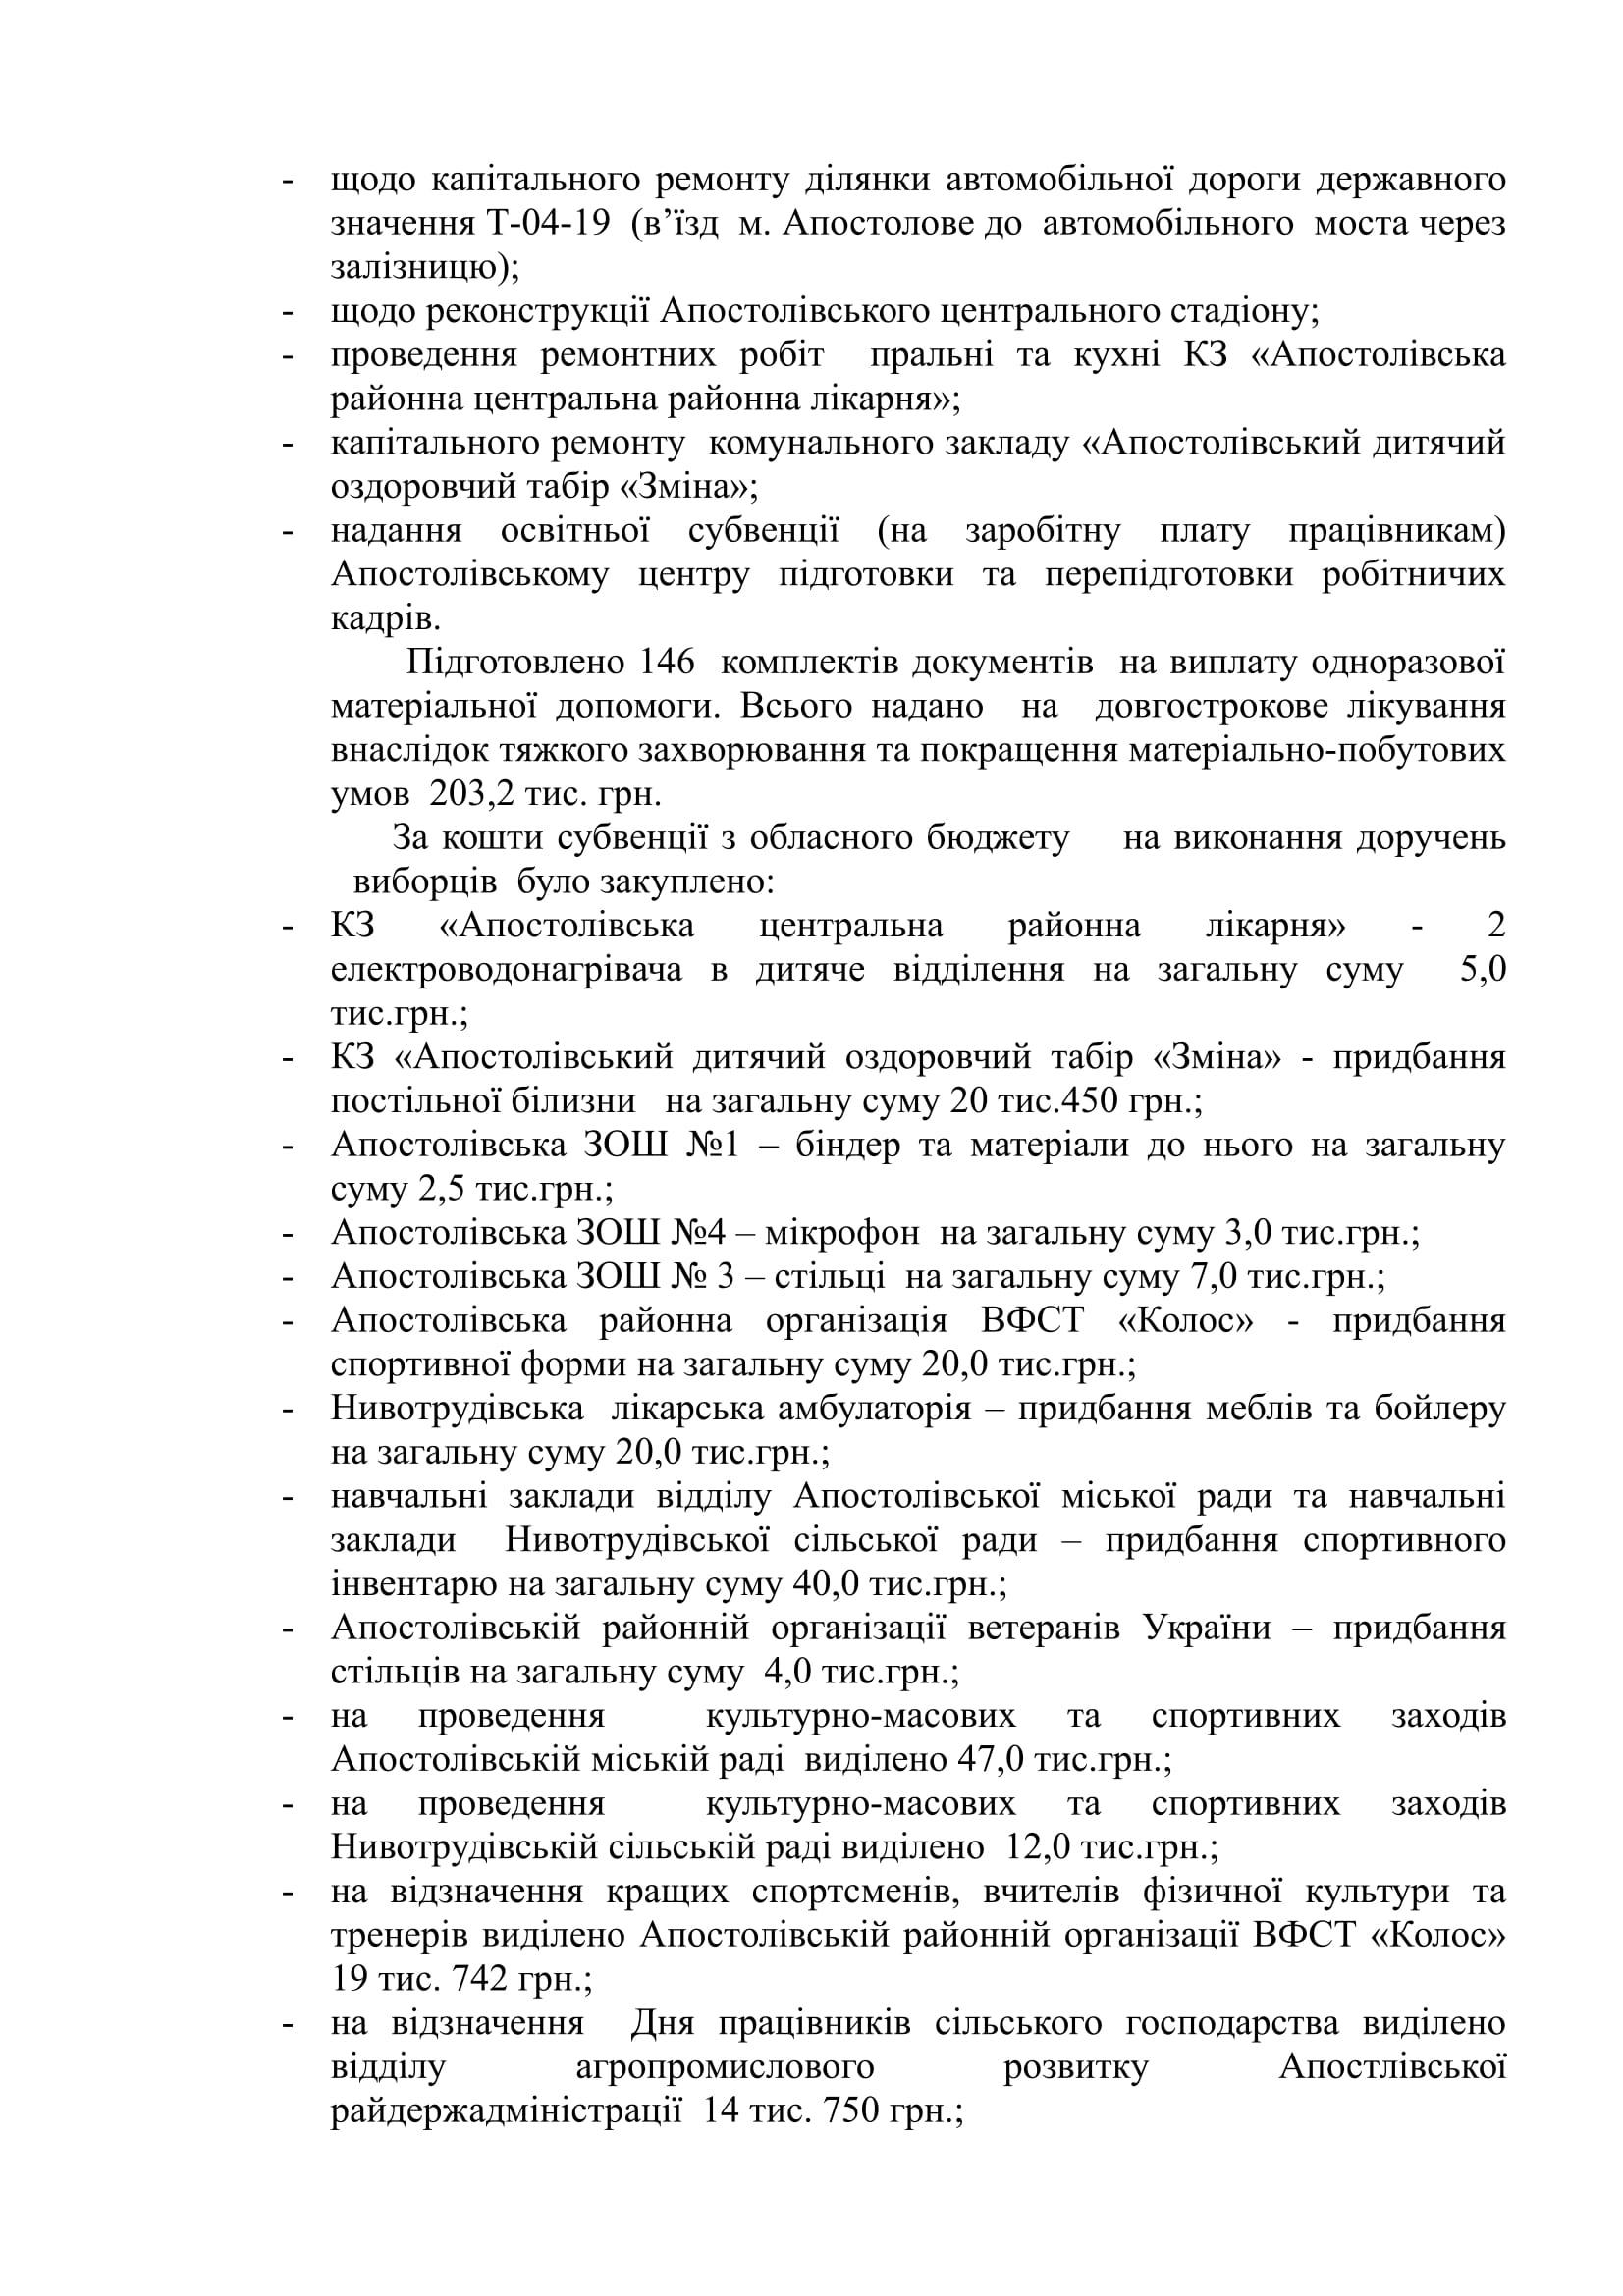 звіт 2 за 2017 рік Доценко Л.С.-2